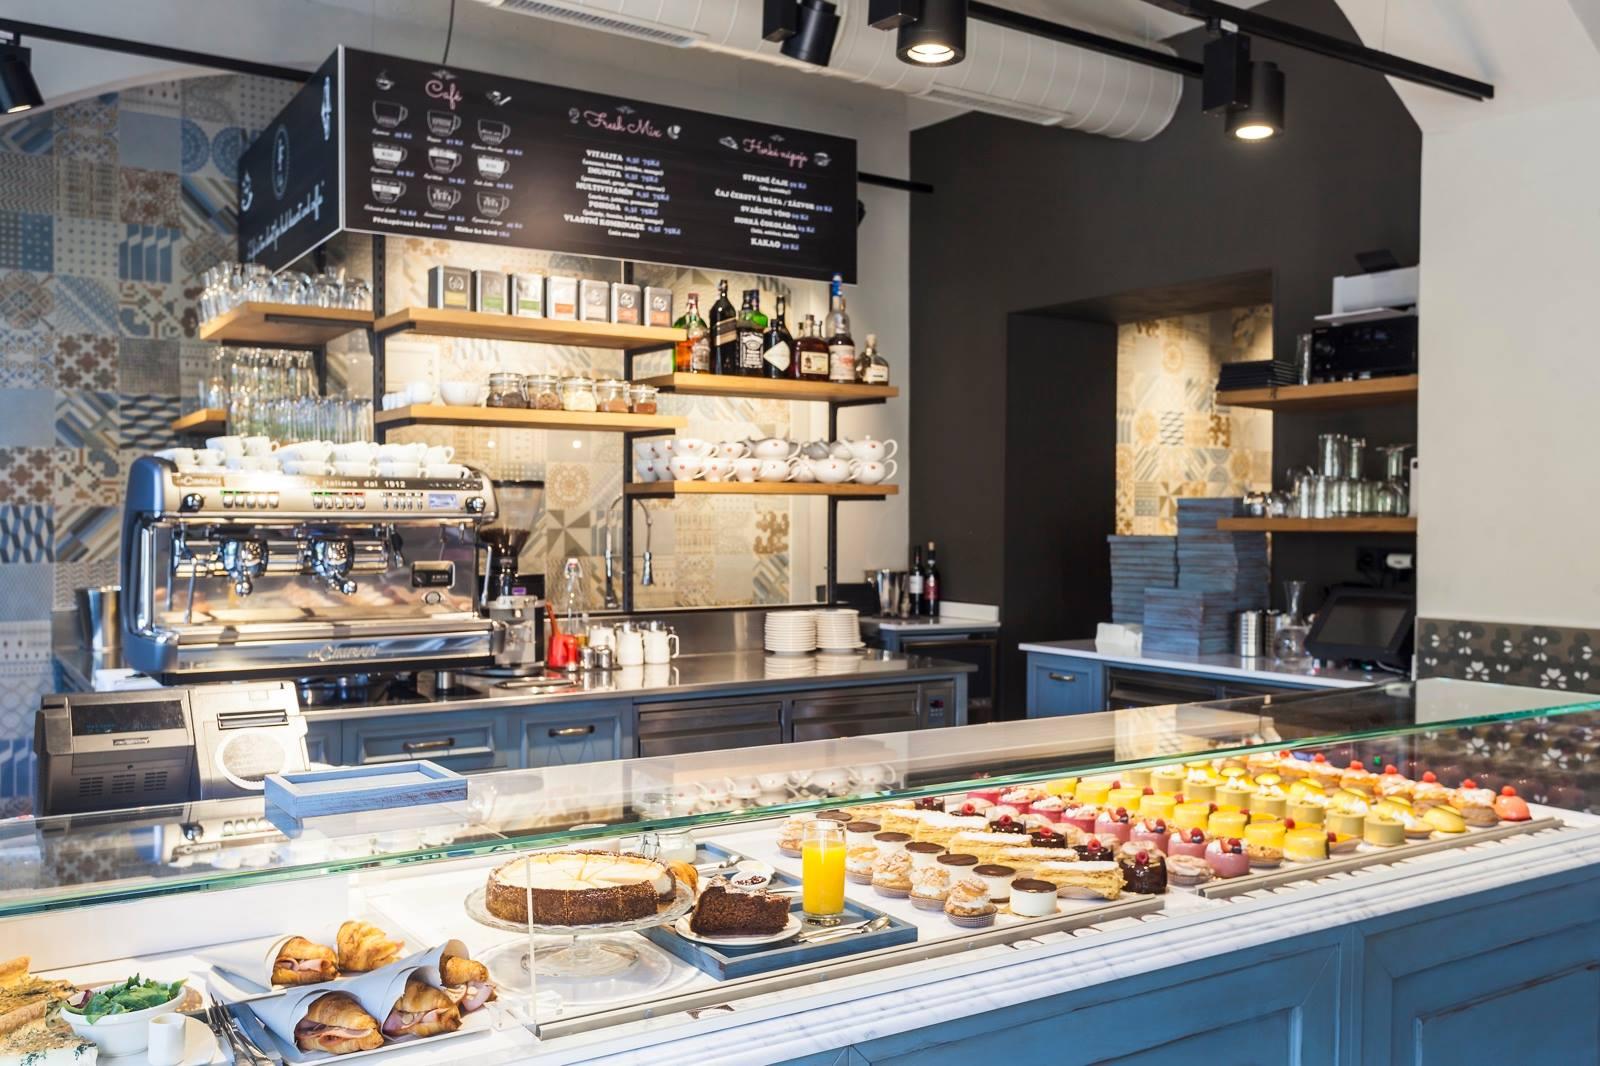 If Cafe Prague